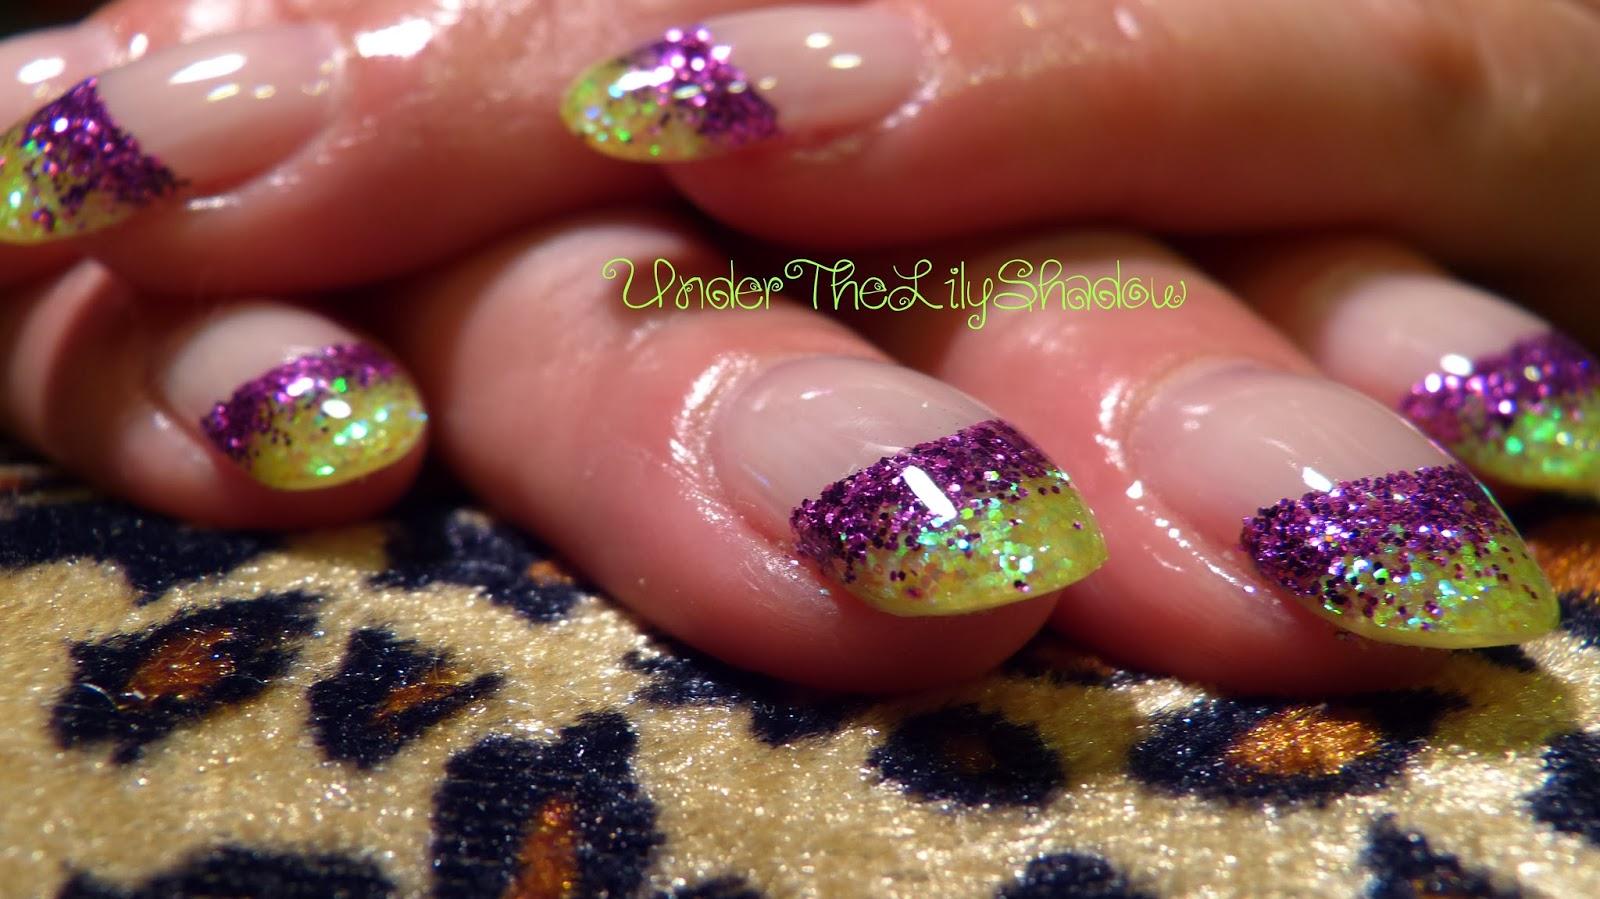 underthelilyshadow nicki minaj nails